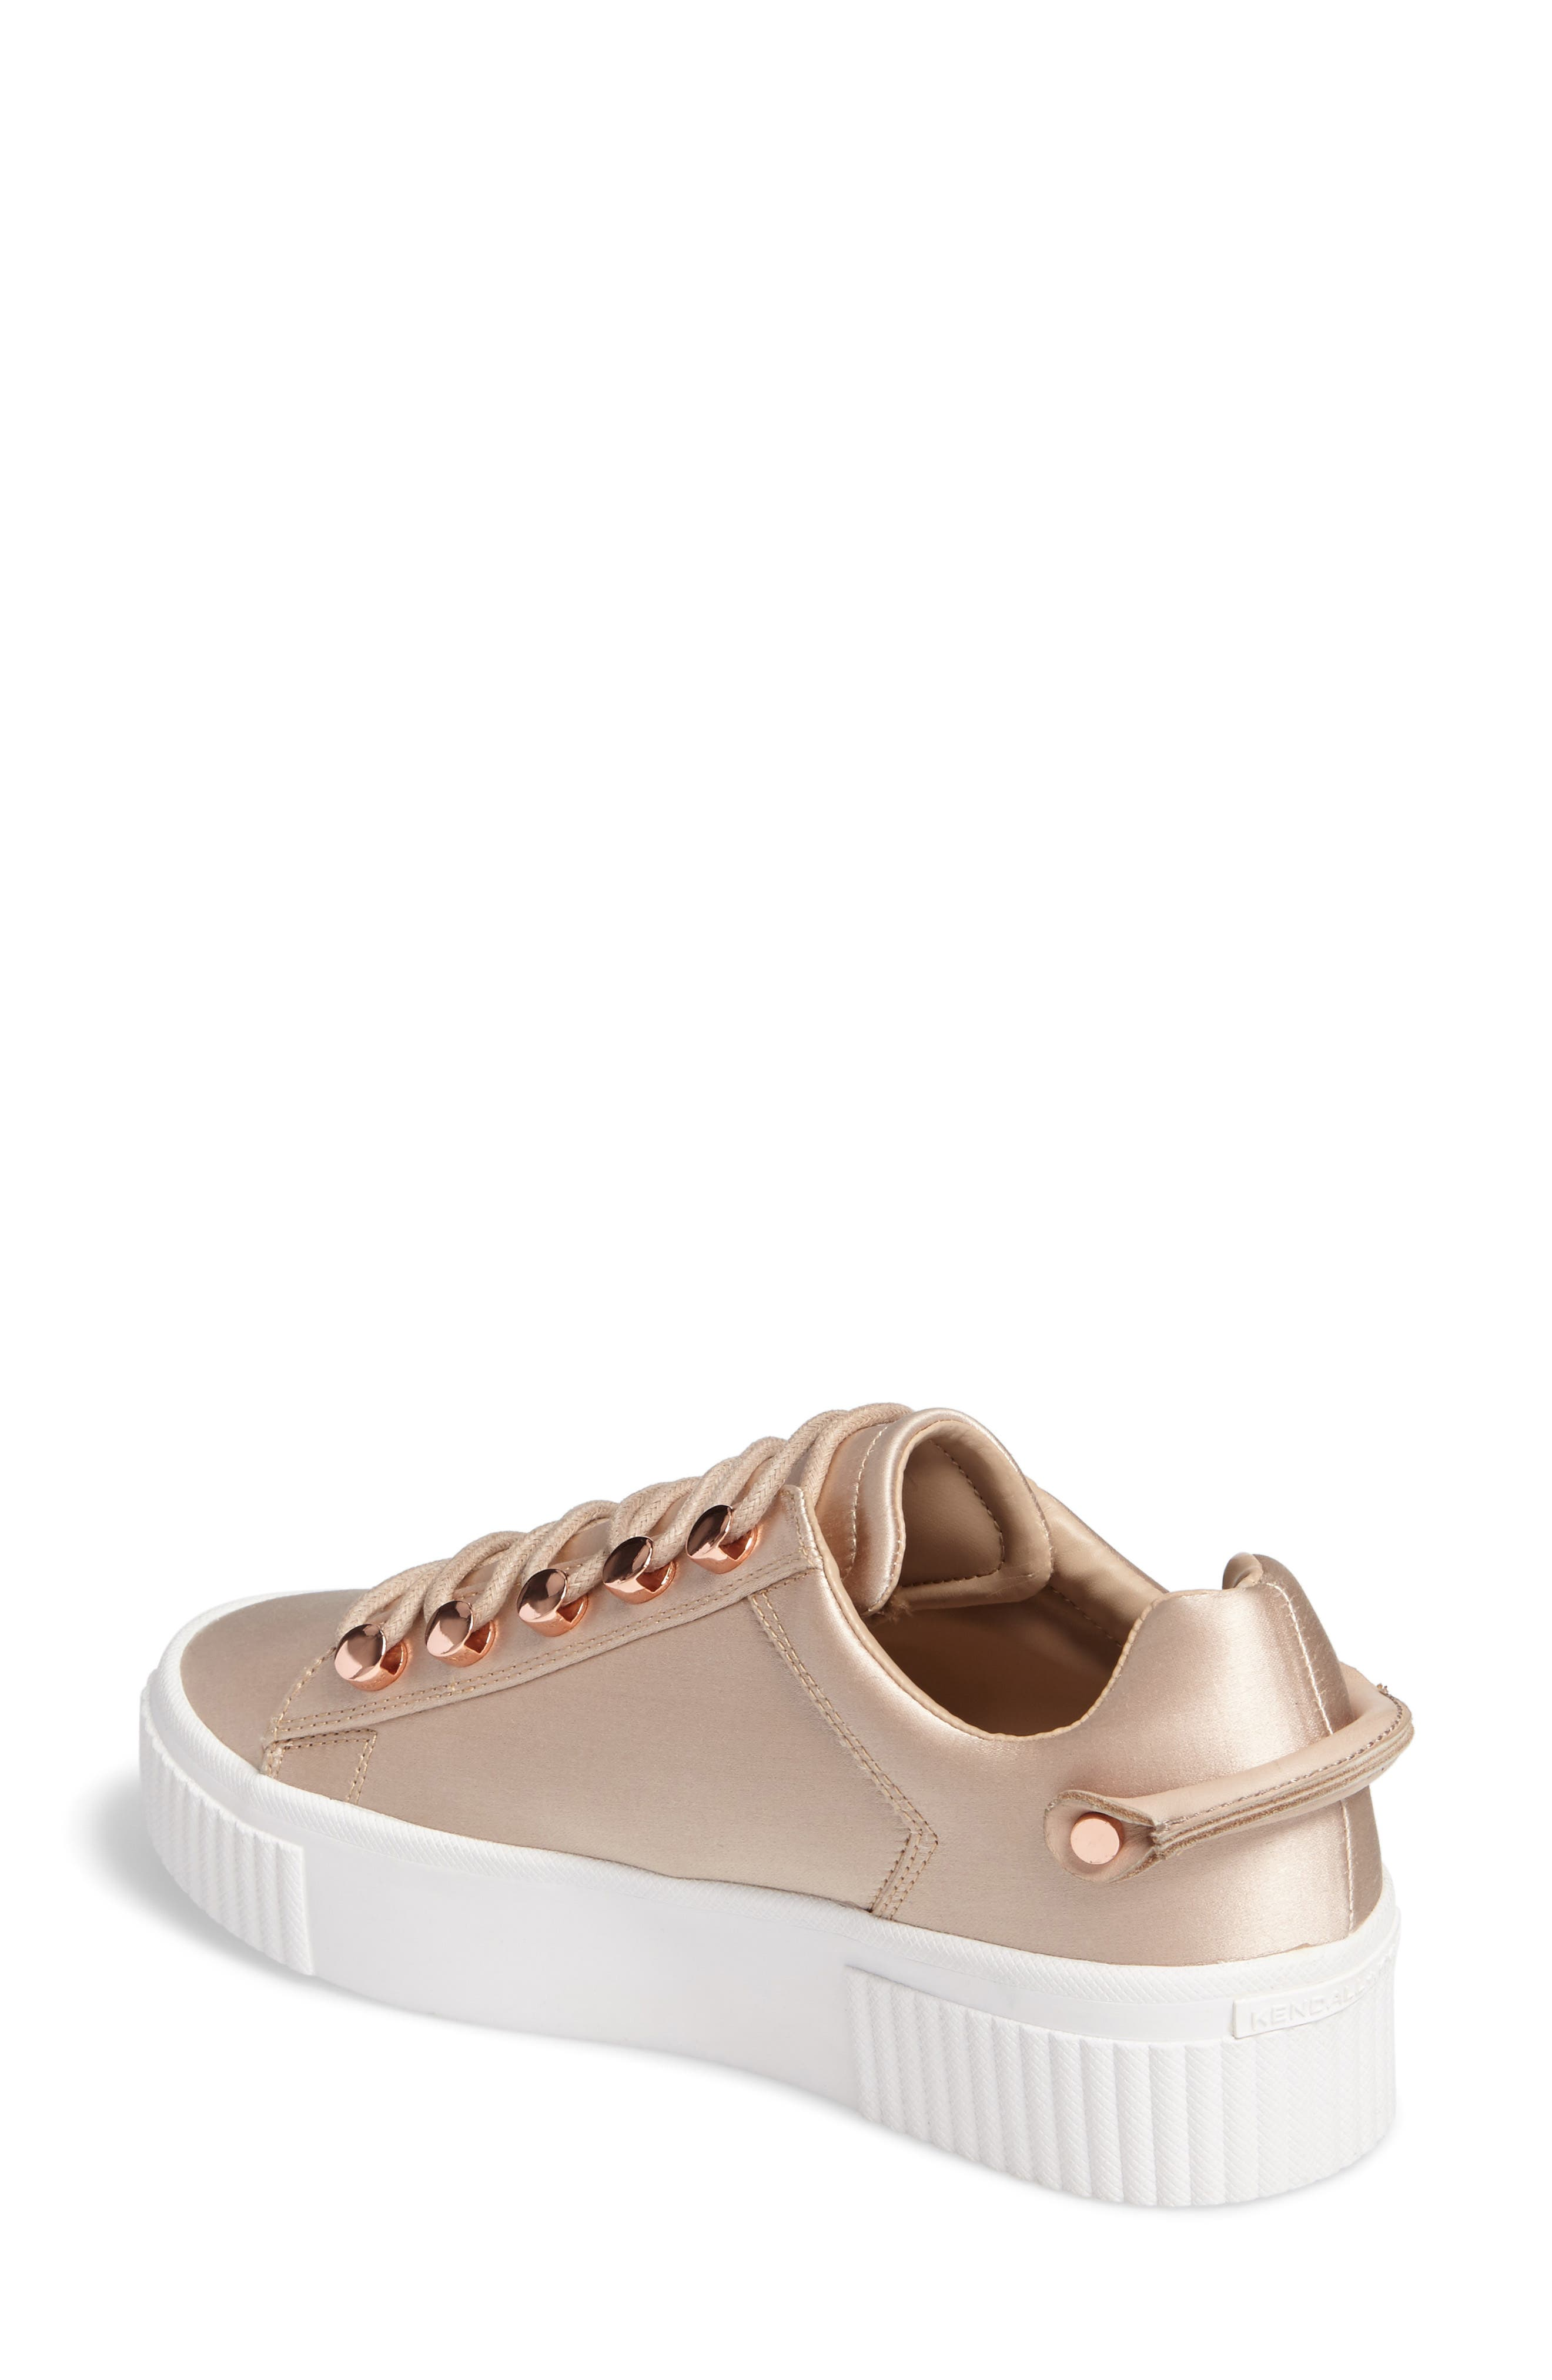 Rae 3 Platform Sneaker,                             Alternate thumbnail 2, color,                             Blush Satin